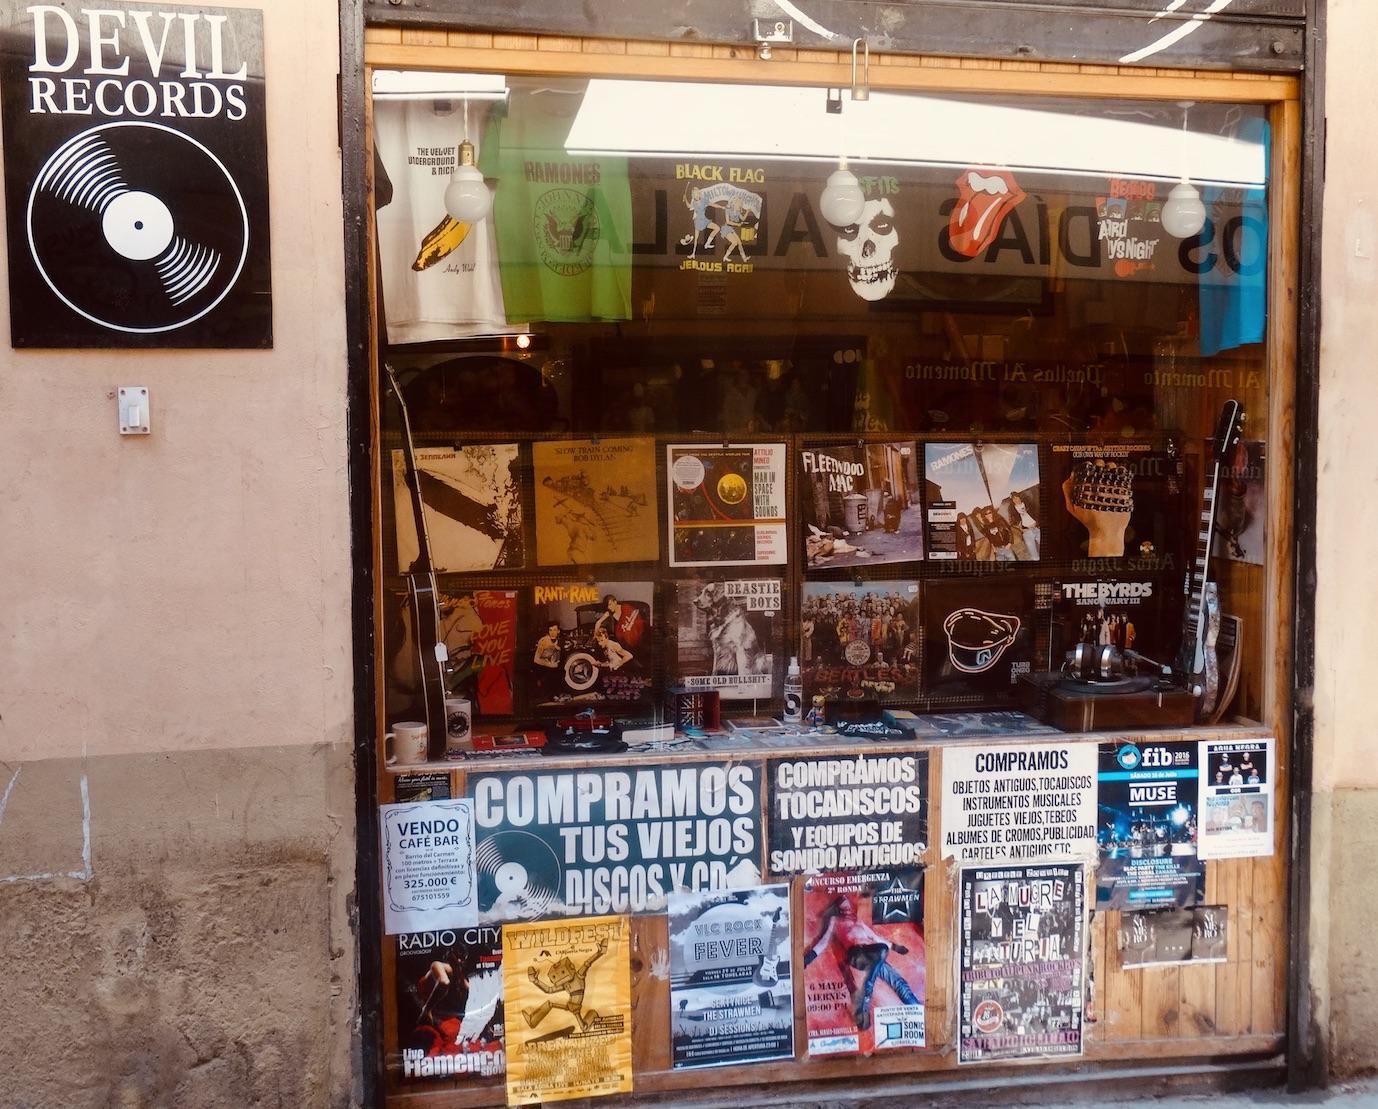 Devil Records Valencia Spain.